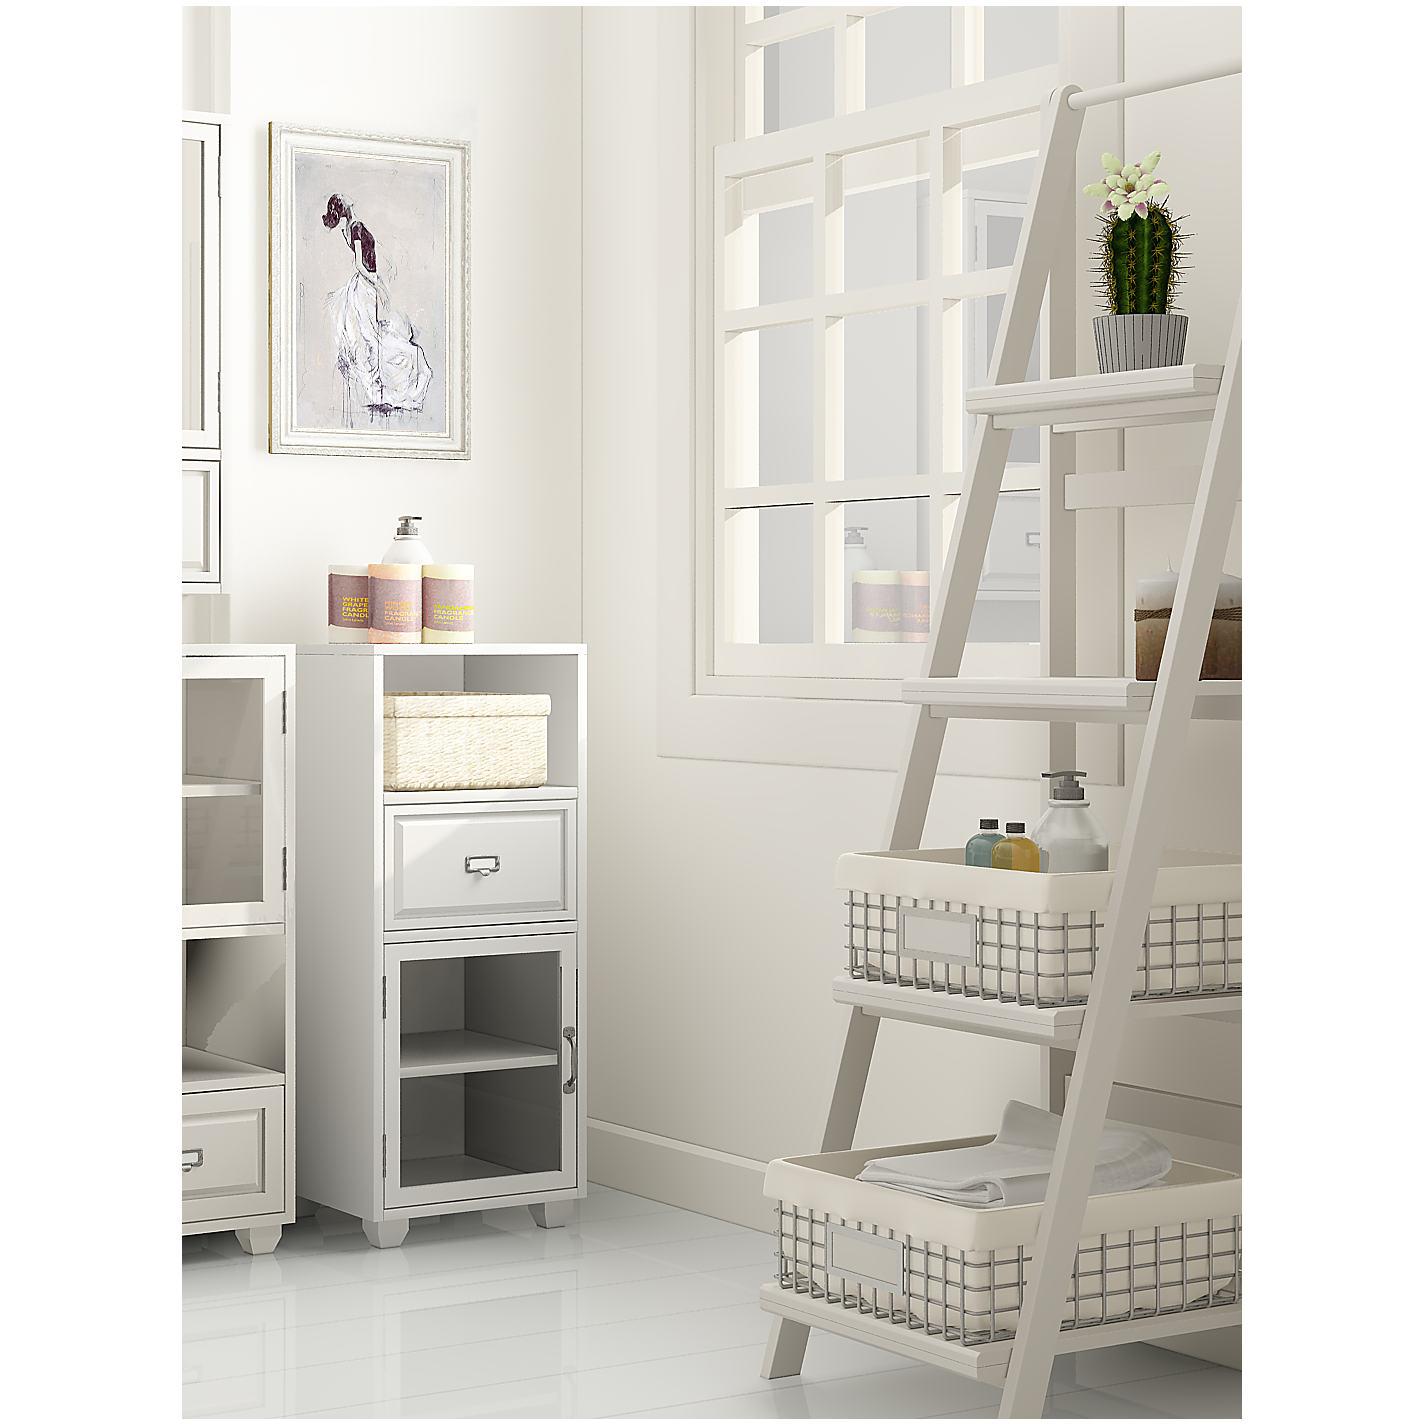 Buy John Lewis Apothecary Bathroom Furniture Range Online At Johnlewis.com  ...